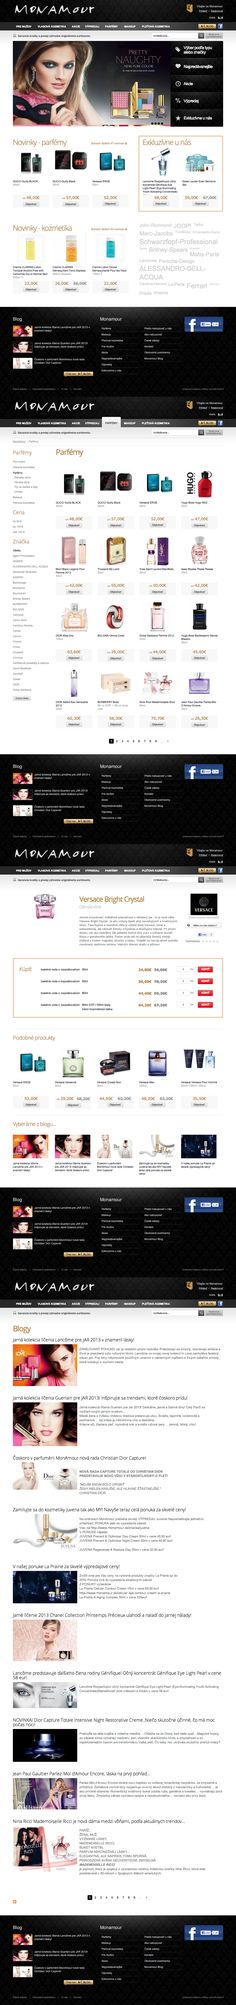 Web design - Monamour.sk Marlow, Web Design, Image, Design Web, Website Designs, Site Design